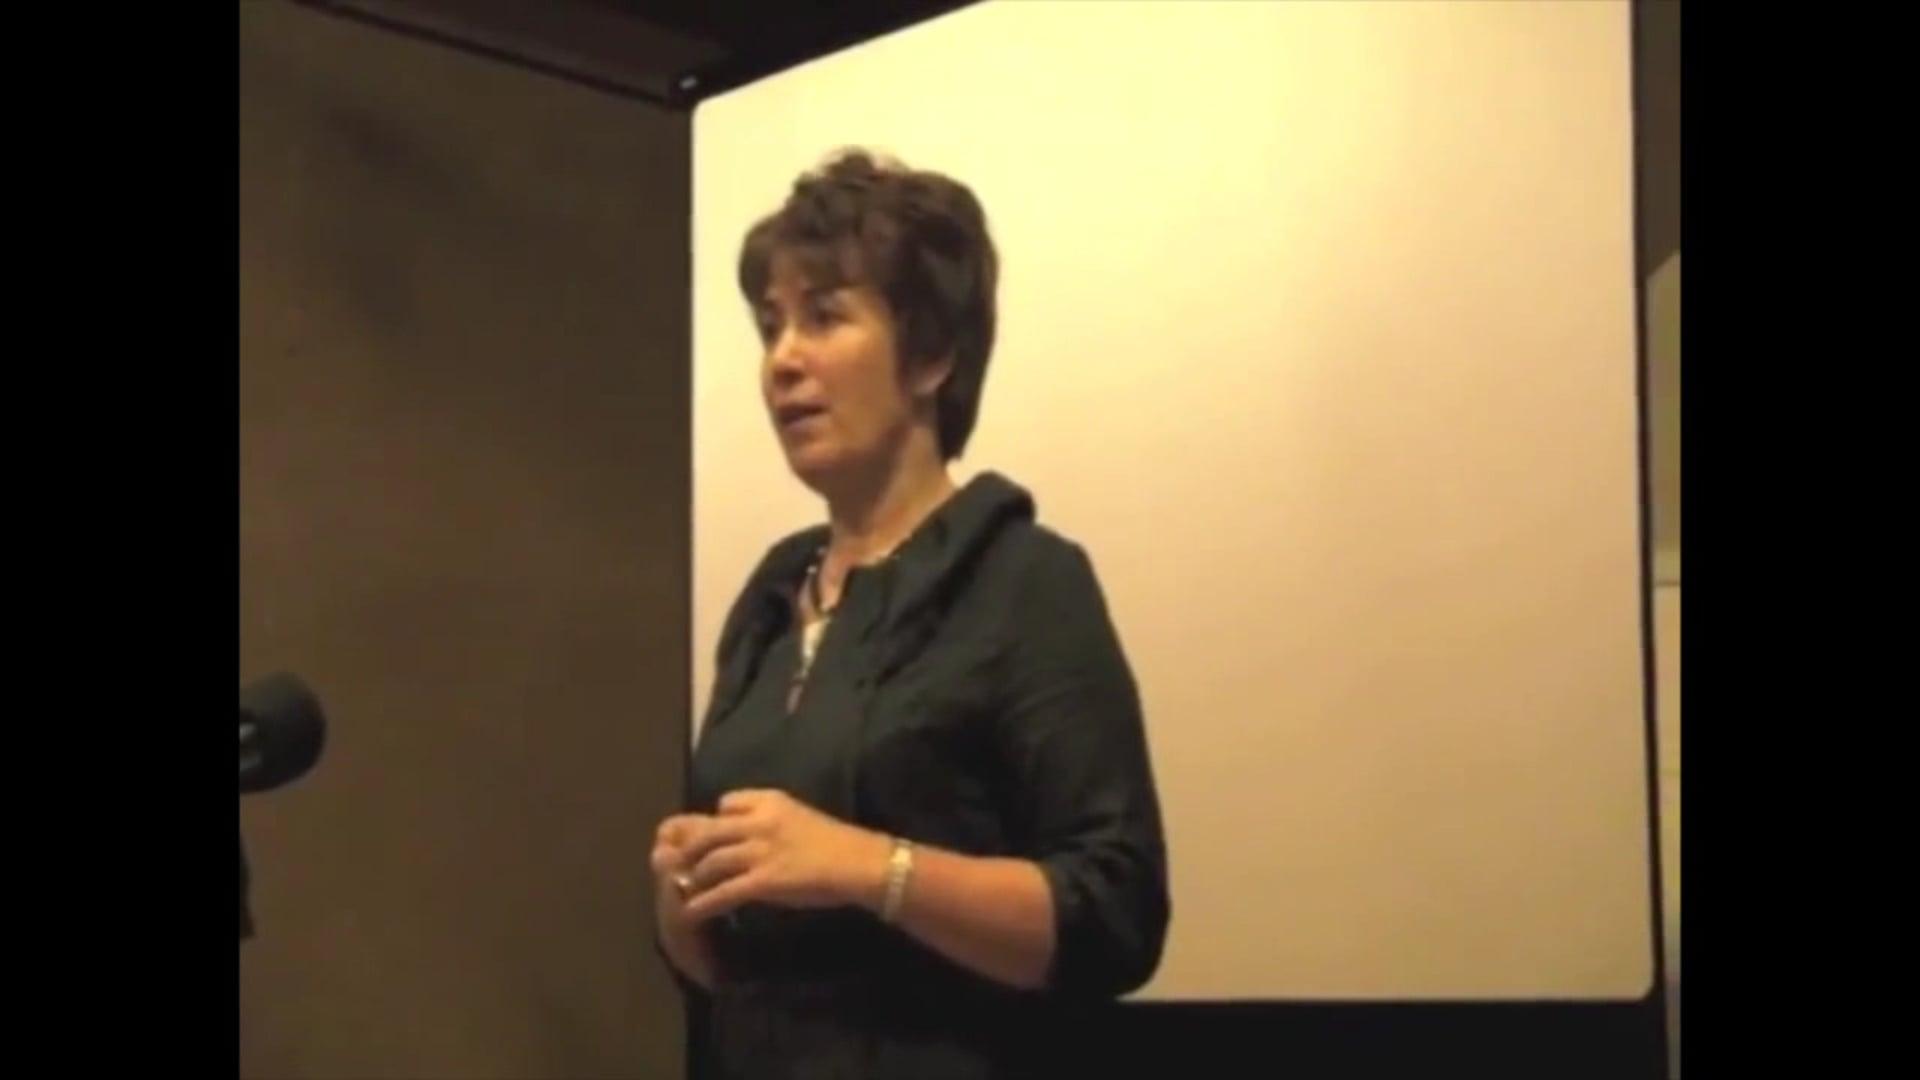 Guestspeaker Elena Tonetti for 'Sustainable Leadership' training in Belgium